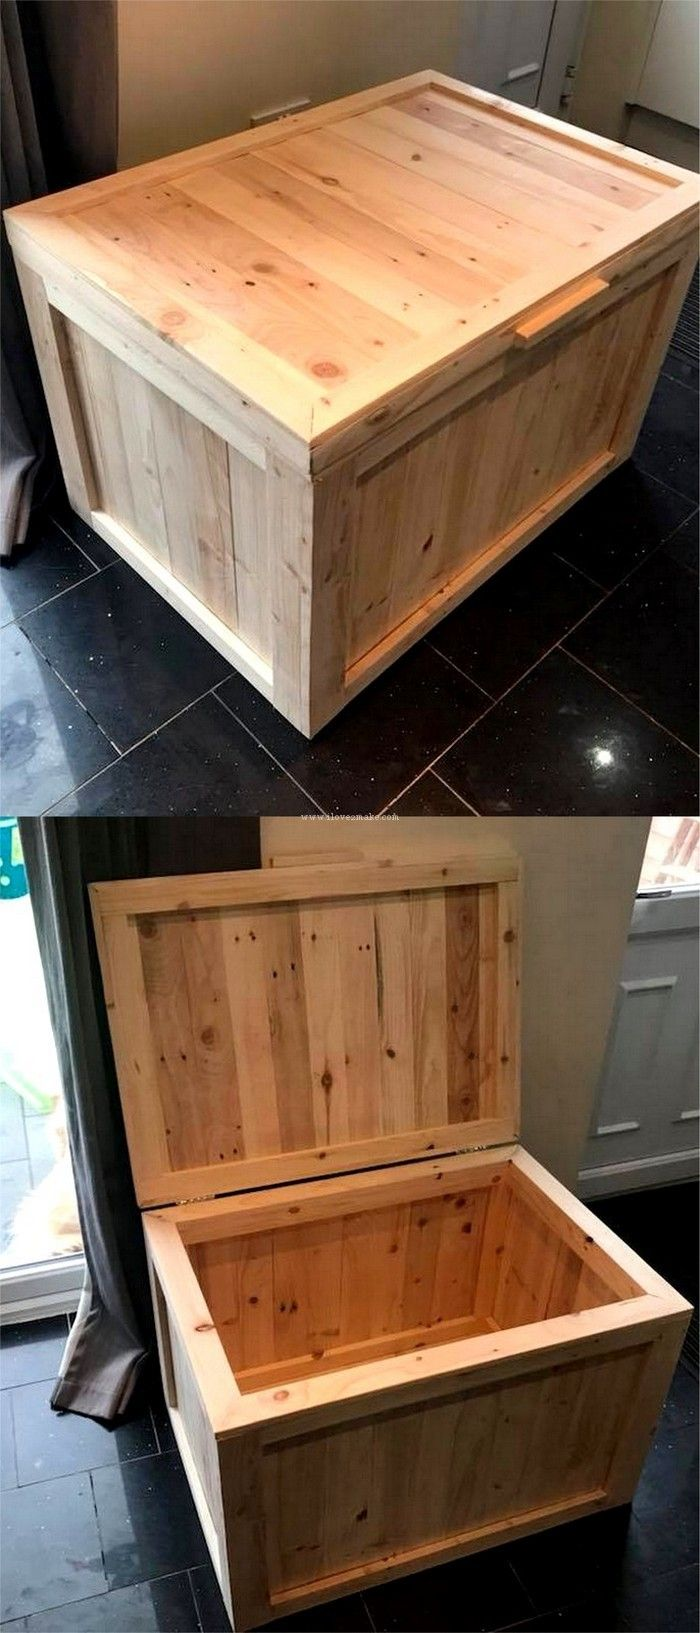 Pallet wooden box idea new design